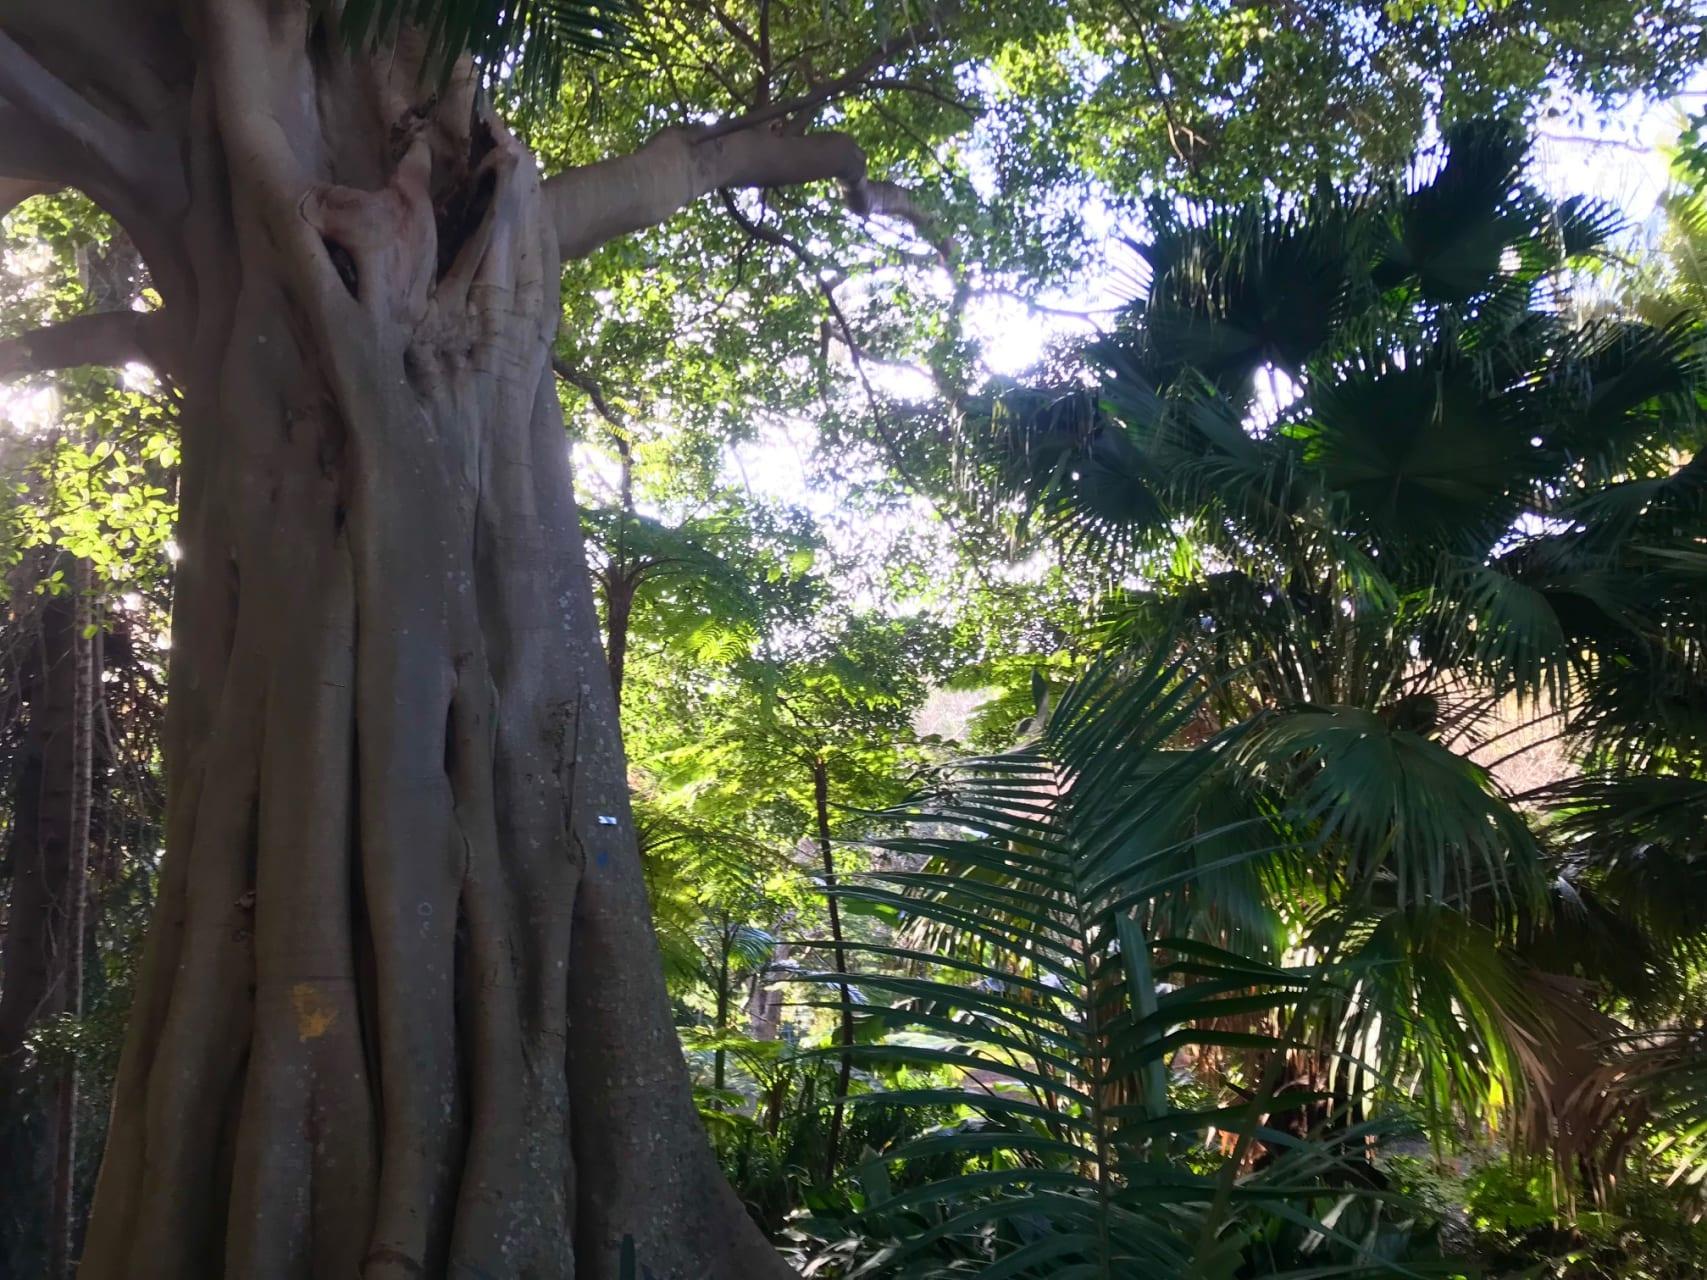 Sydney - Ancient Trees and Turkey Nests - Ivanhoe Park Botanic Garden